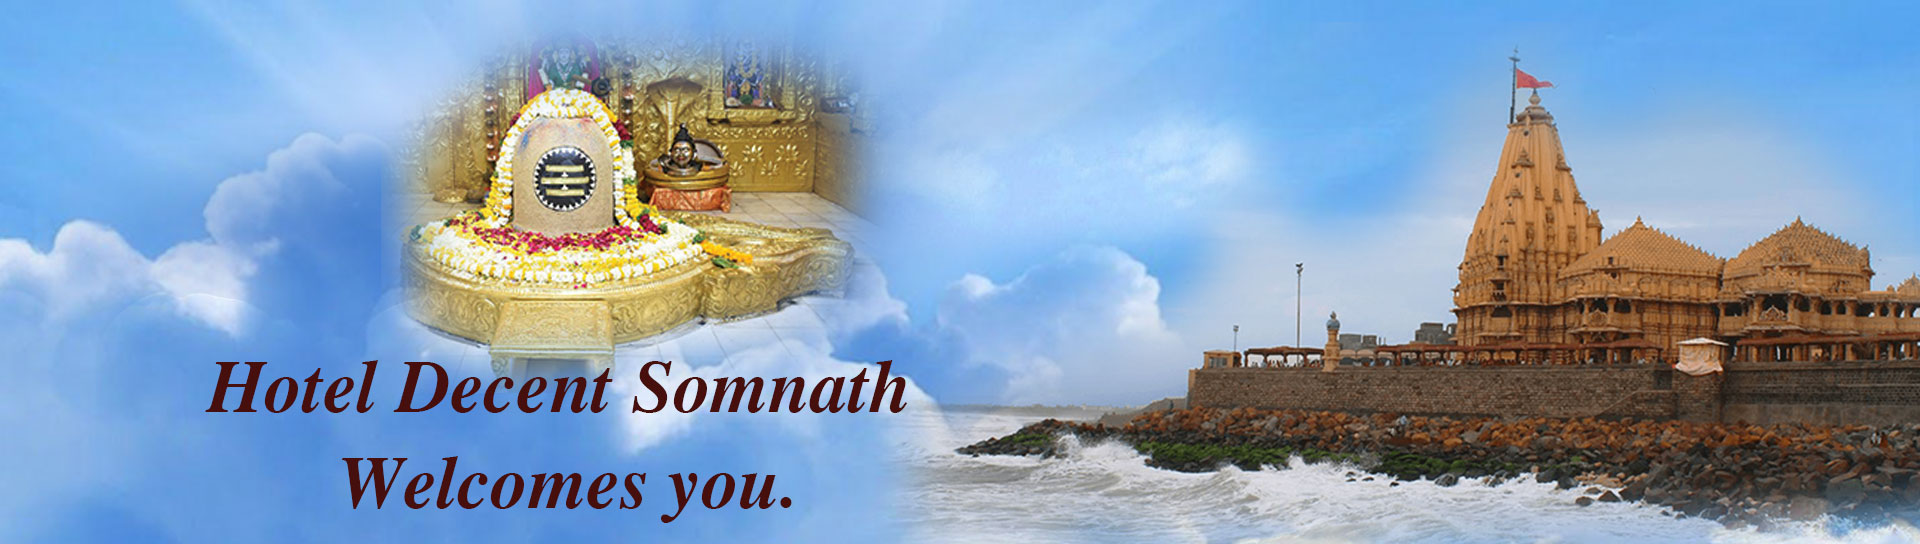 Hotel in Somnath